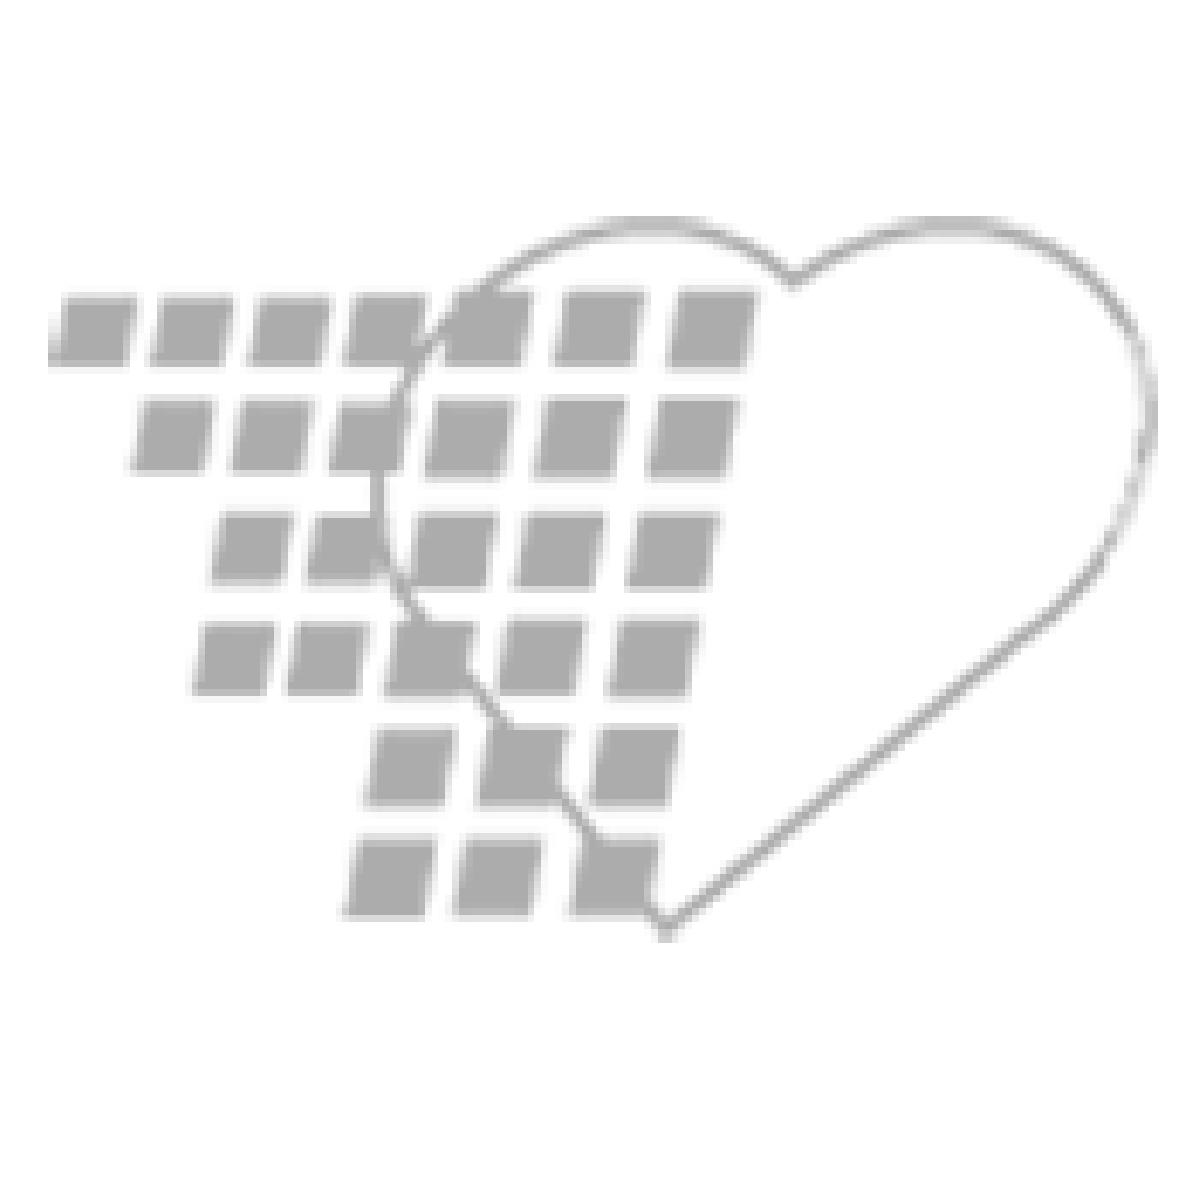 11-98-3000 - Nursing Kelly (SimPad Capable)